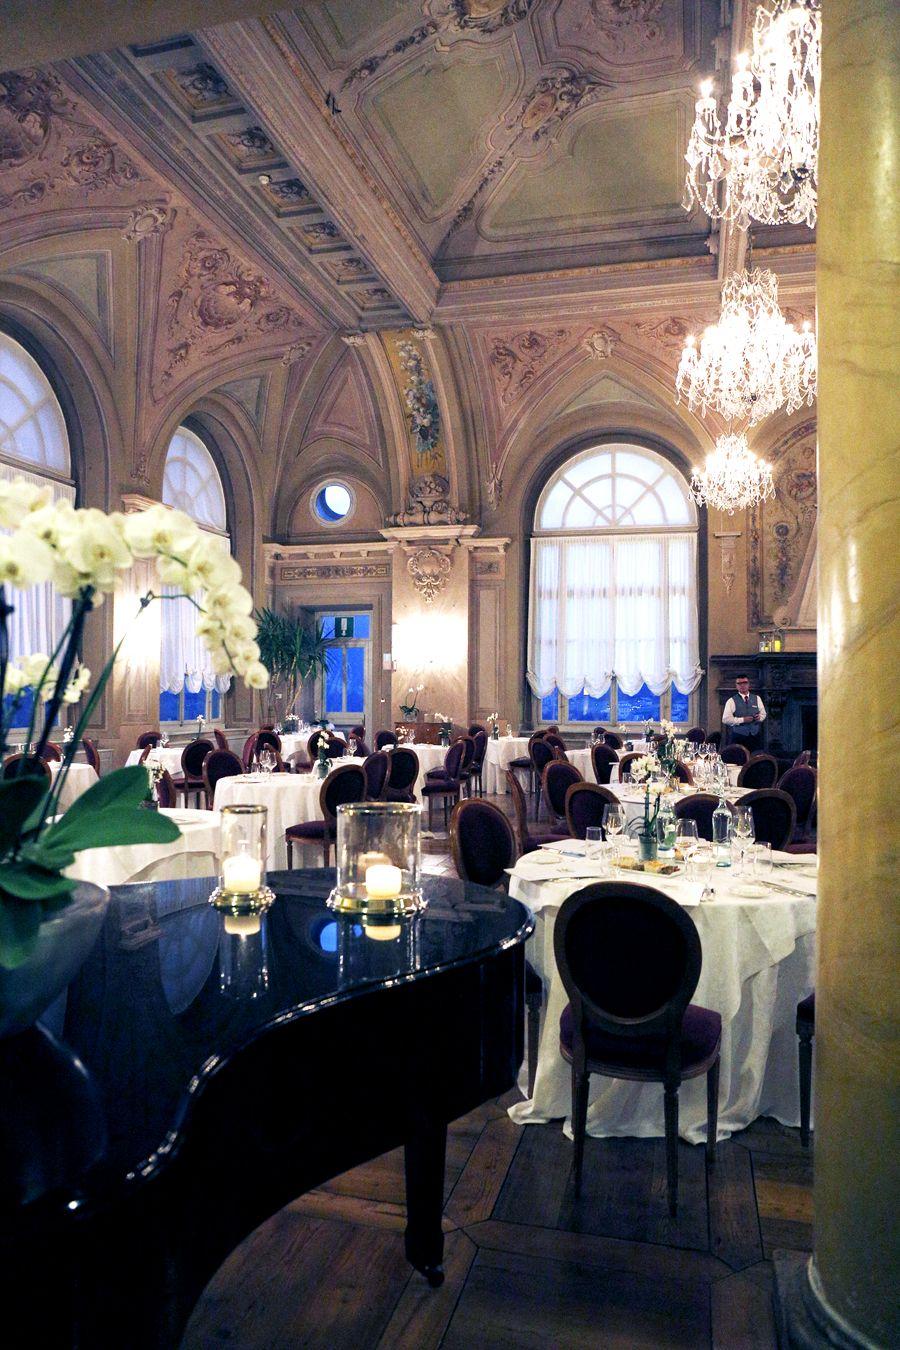 Grand Hotel Bagni Nuovi Bormio, Italy | Bormio | Pinterest | Grand ...